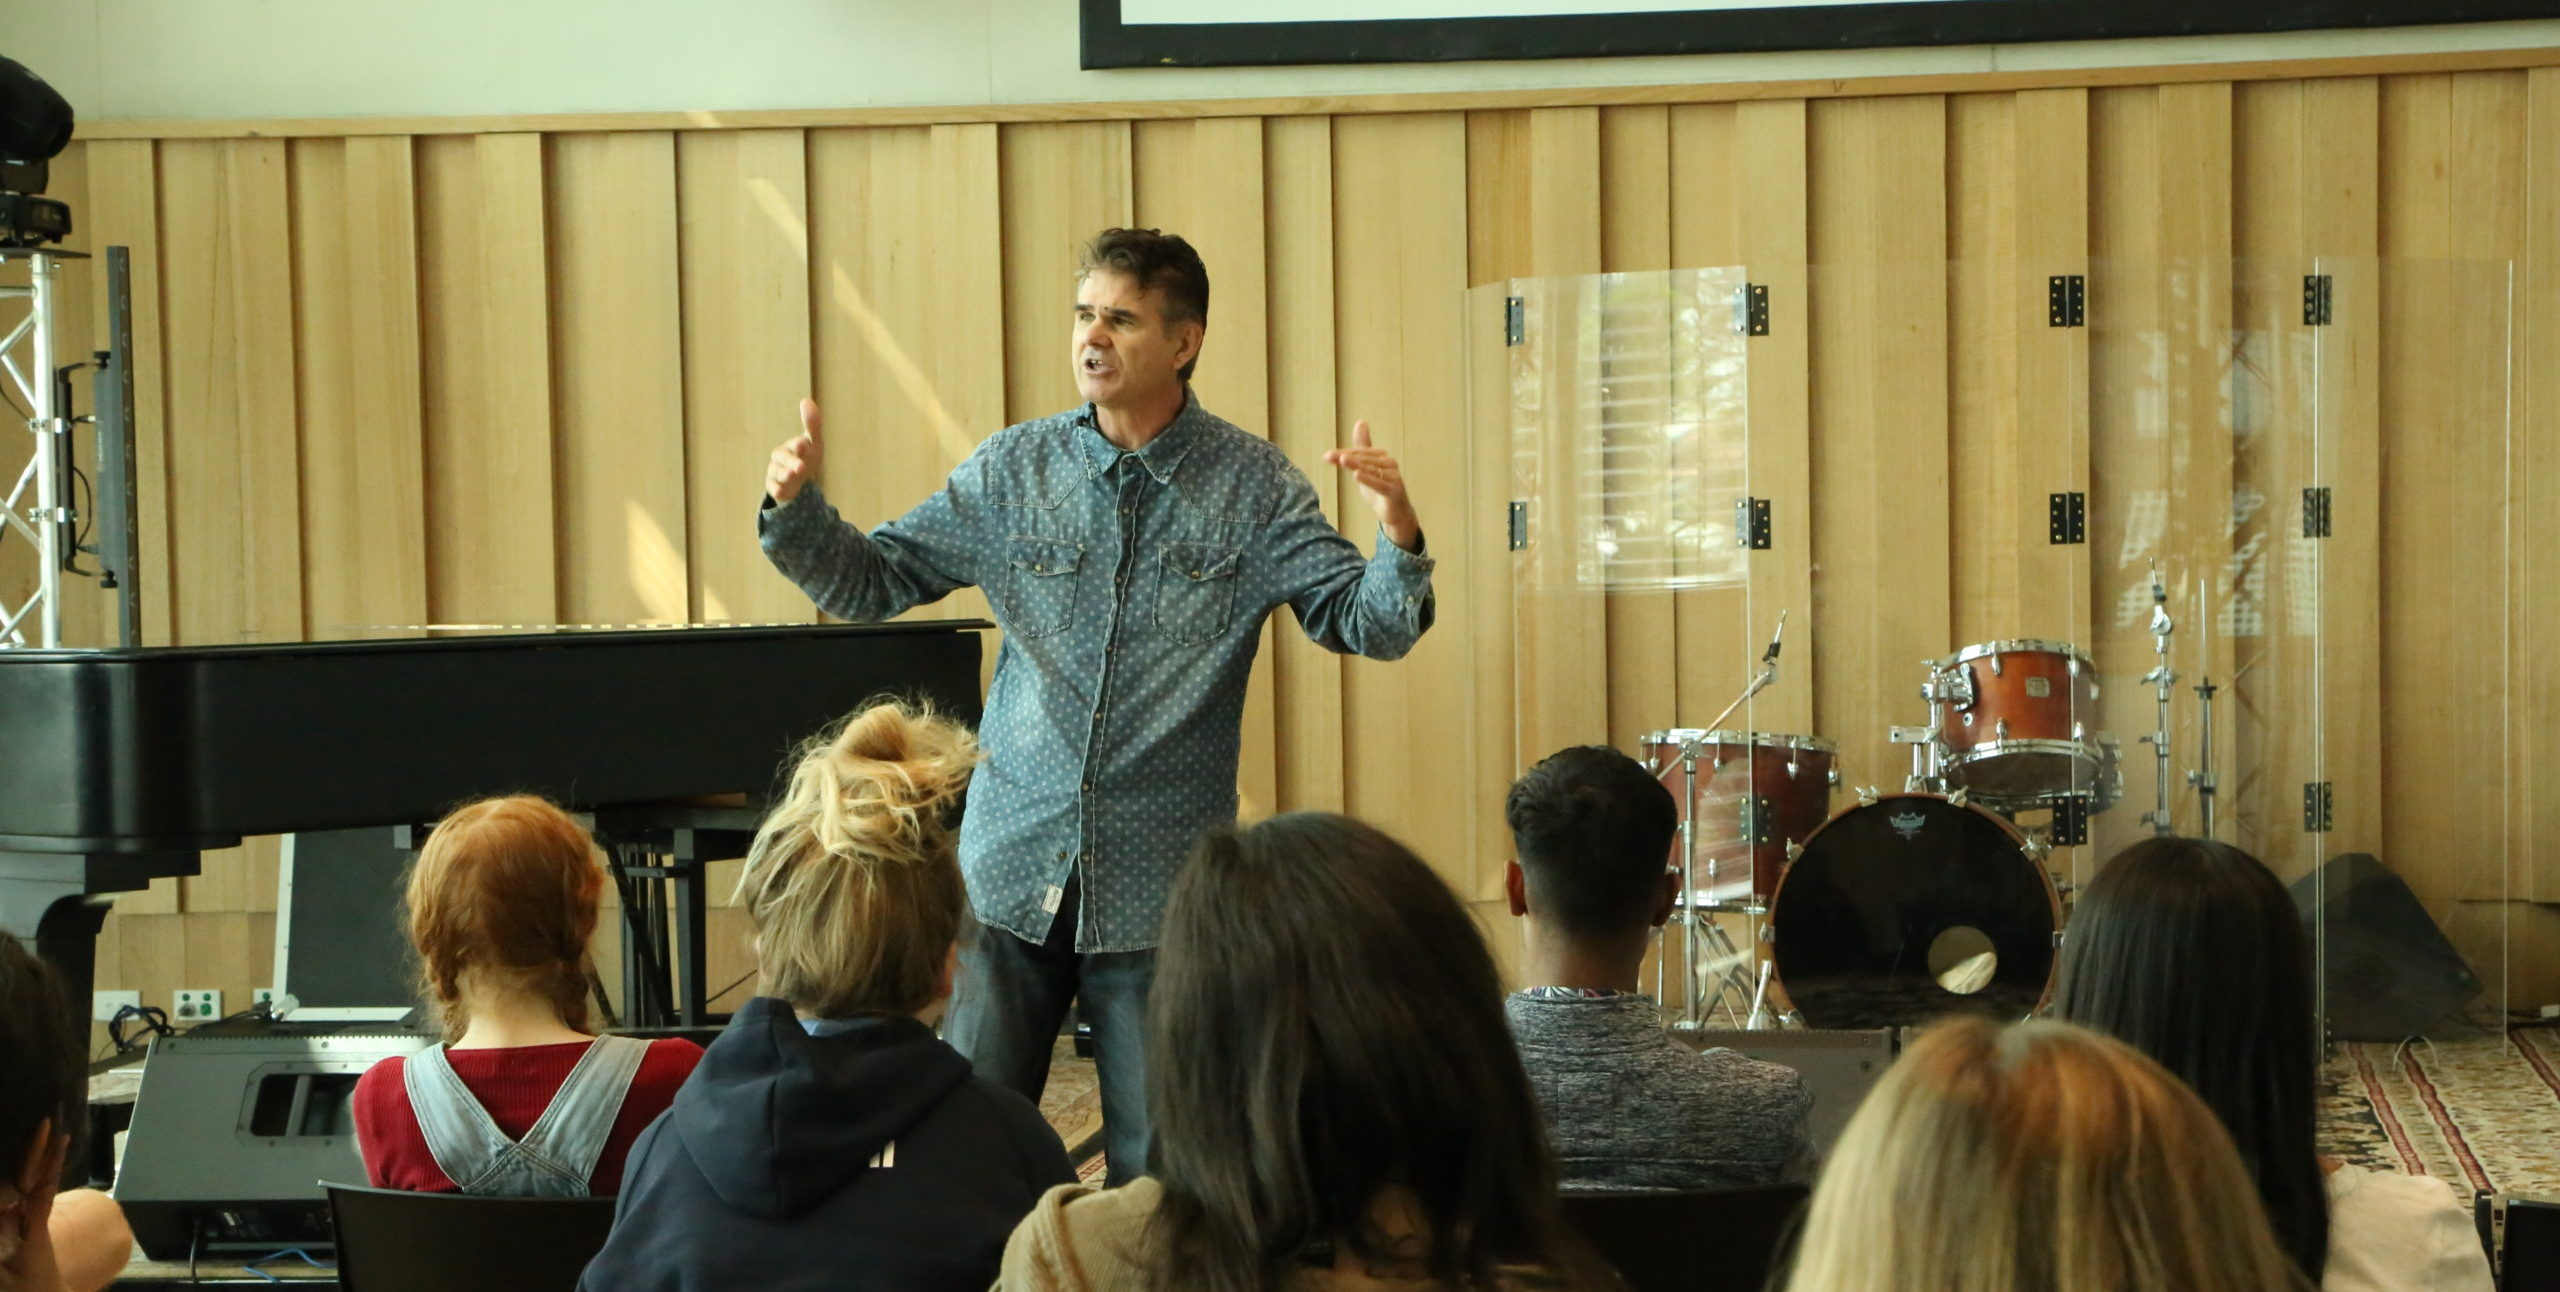 Dr Christian Heim shares mental health advice for uncertain times